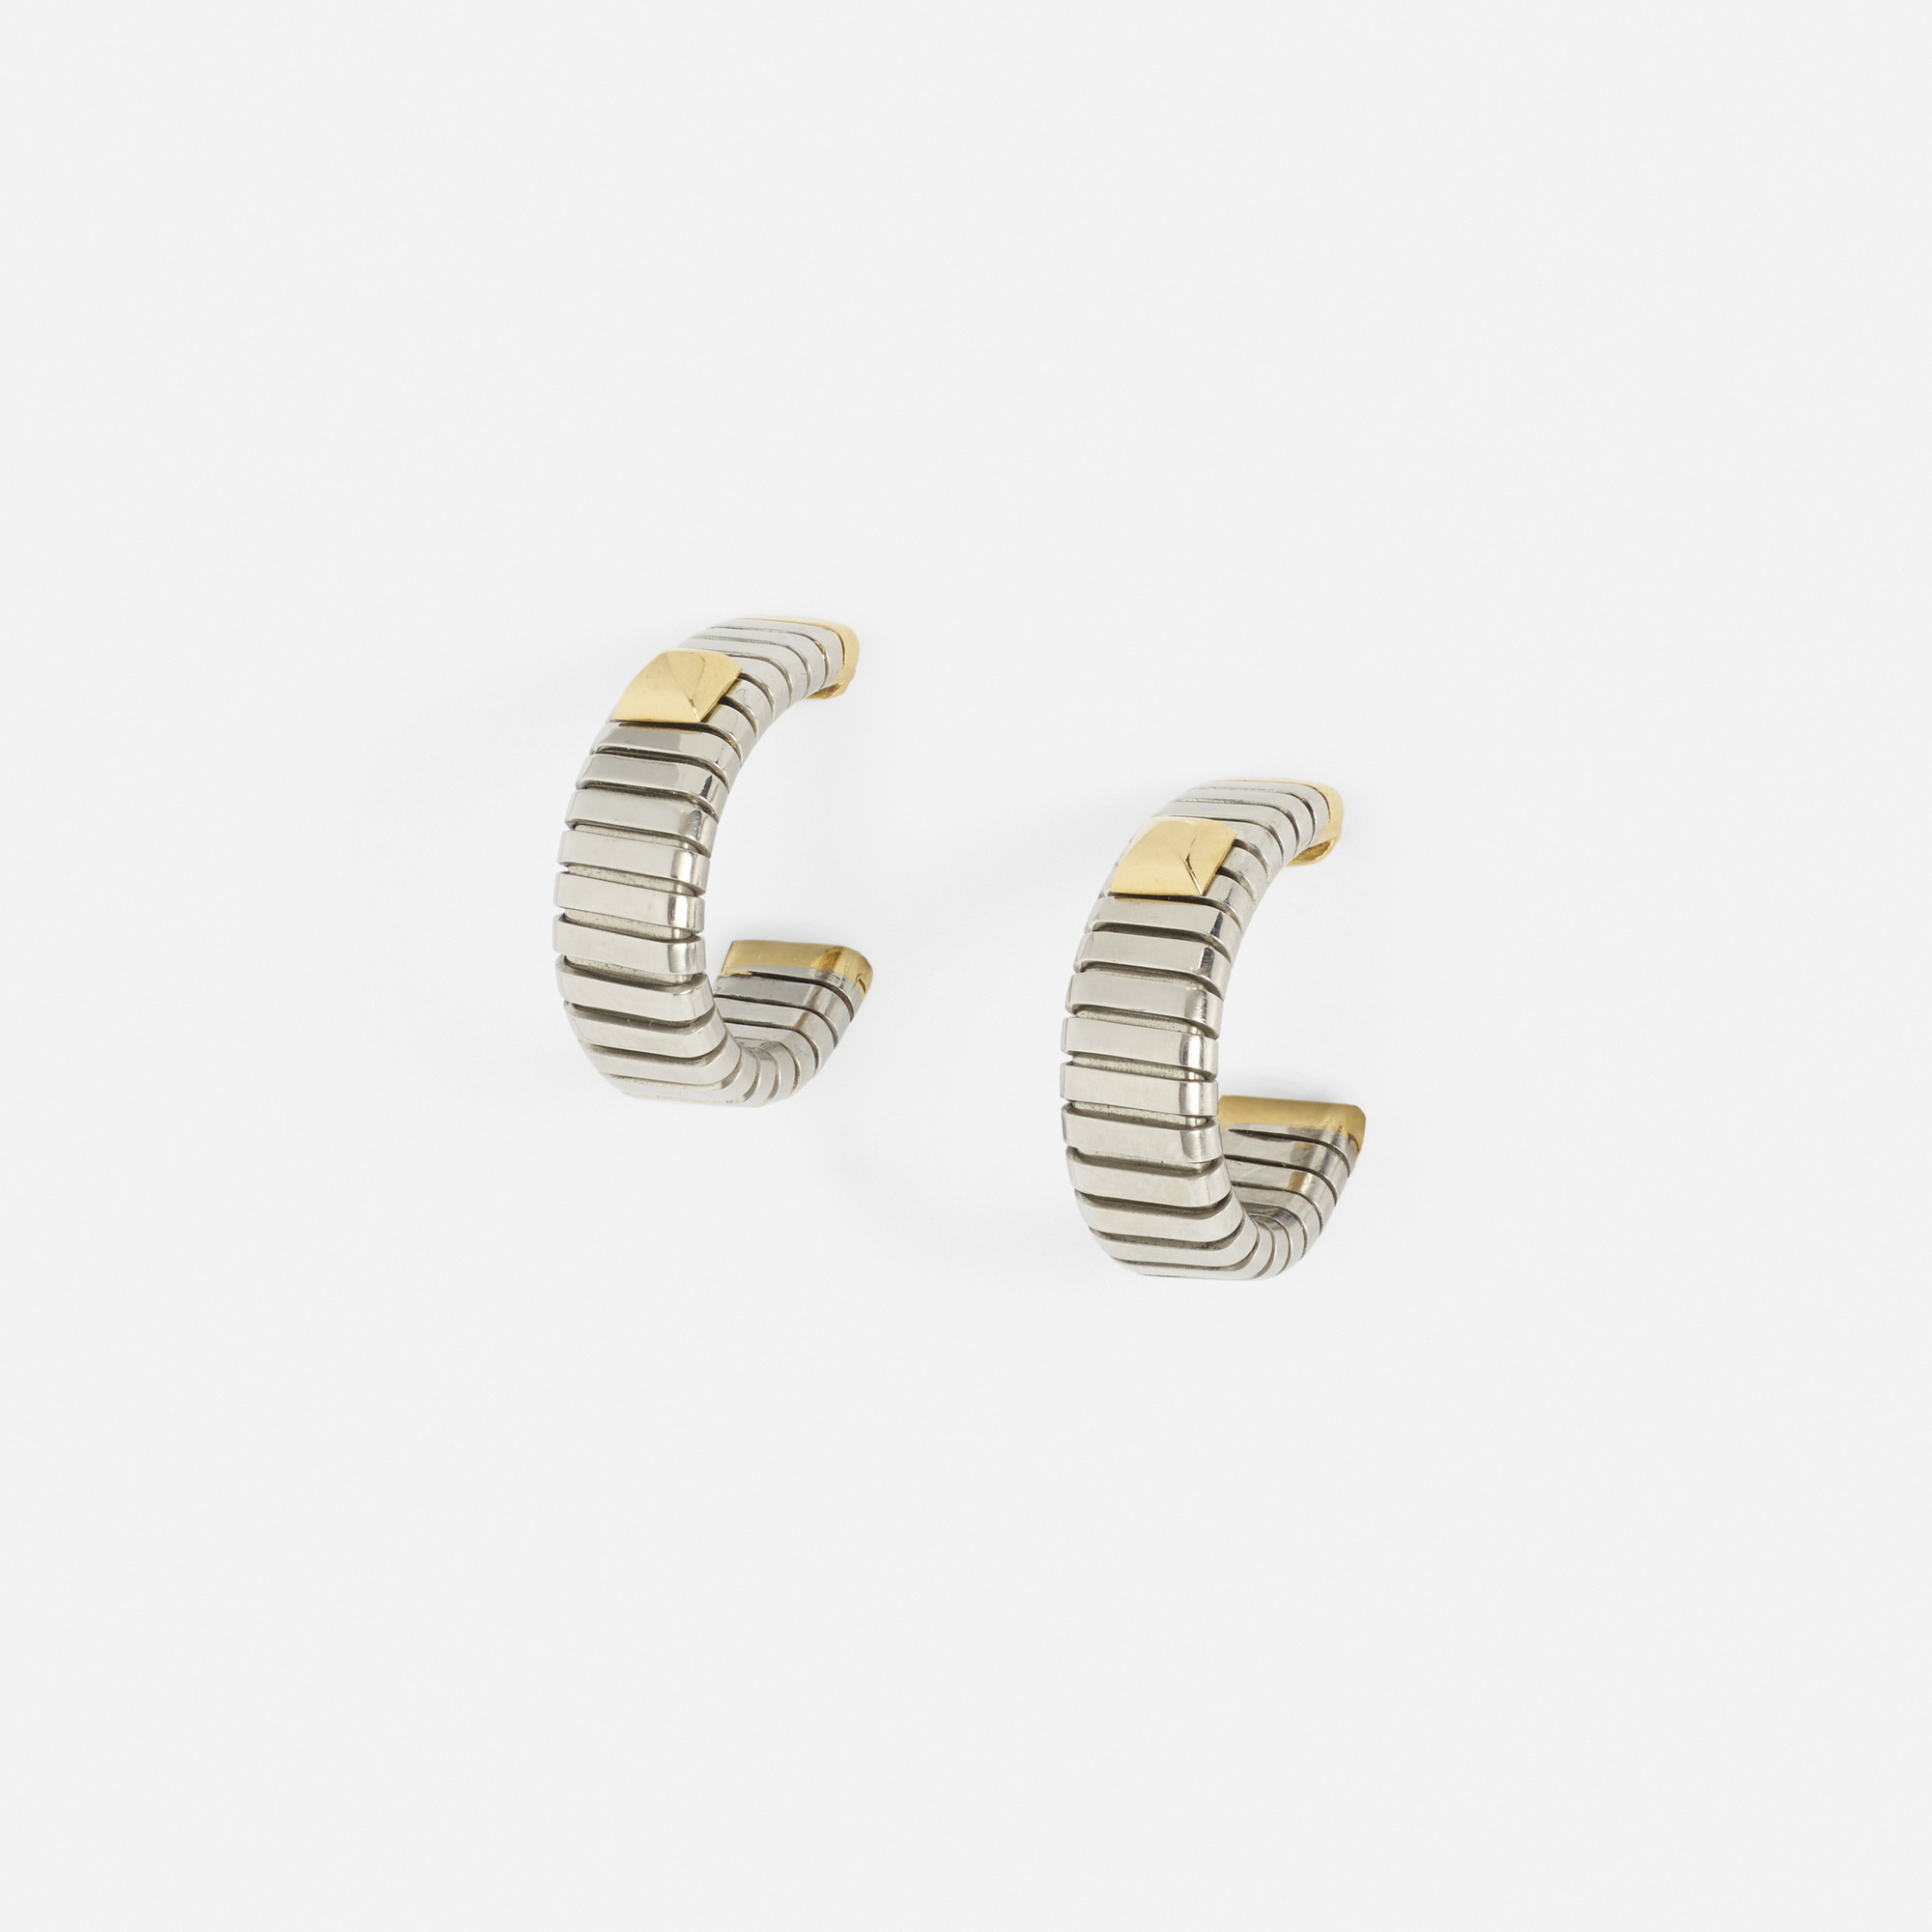 279: Bulgari / A pair of gold and steel earrings (1 of 1)